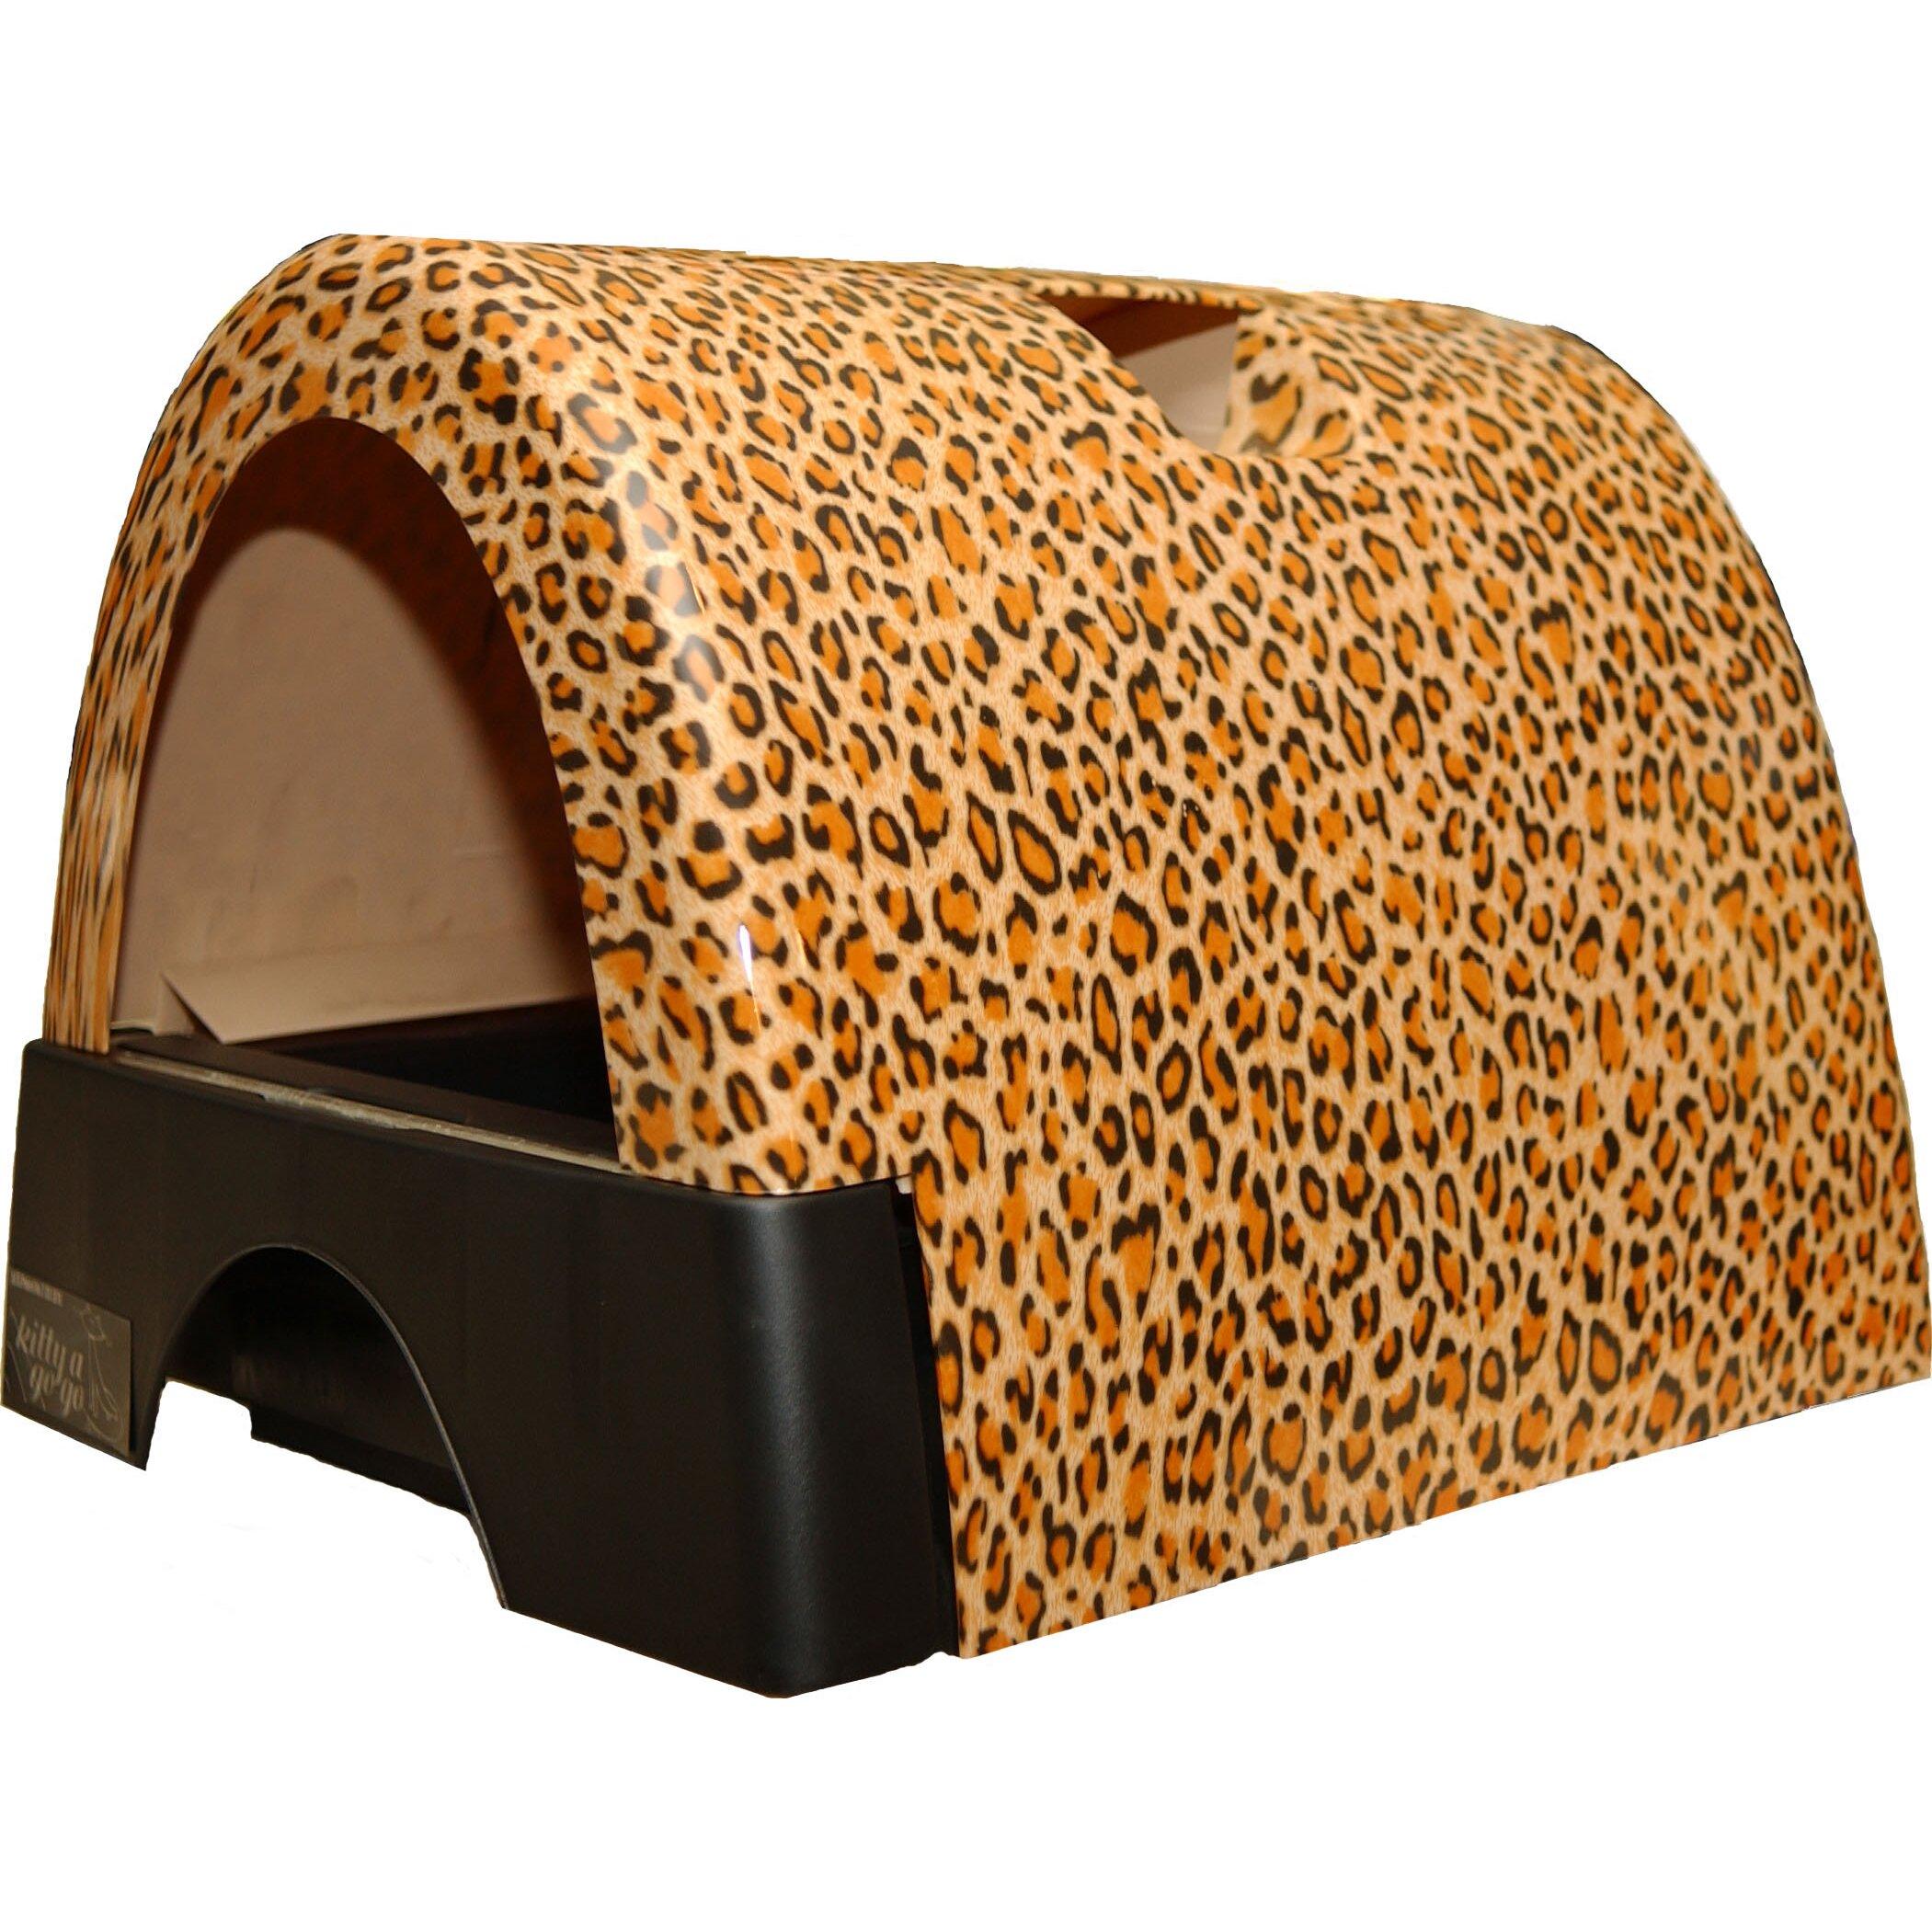 kittyagogo designer cat litter box with new leopard print cover reviews wayfair. Black Bedroom Furniture Sets. Home Design Ideas